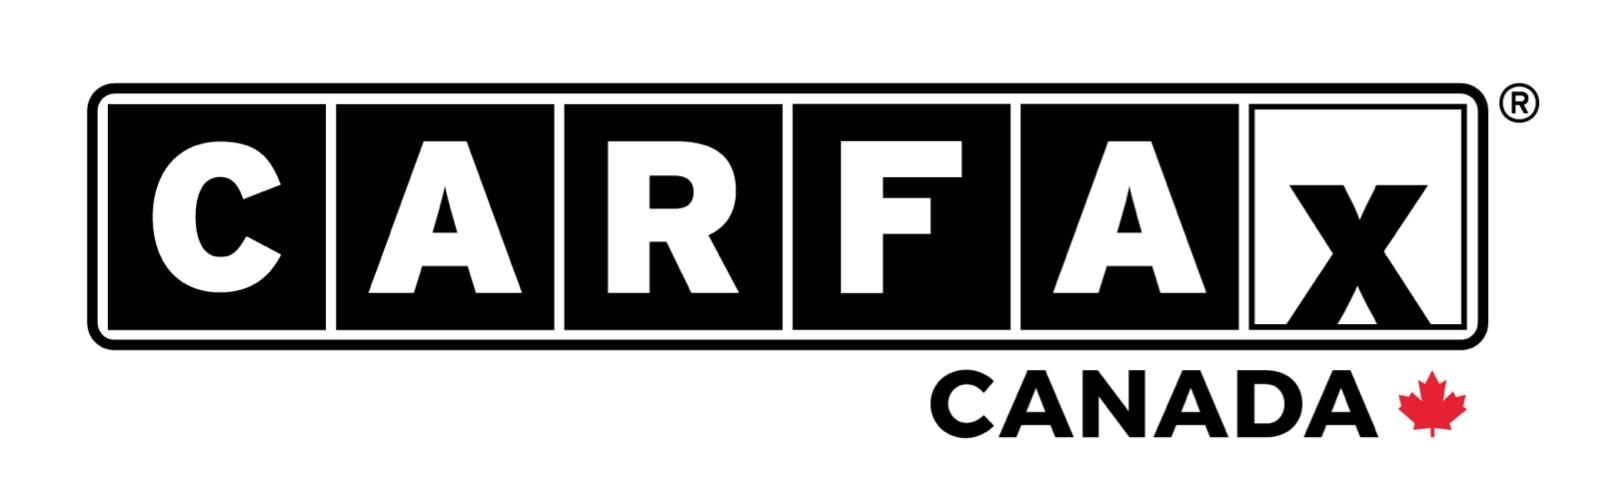 Carfax West Coast Nissan